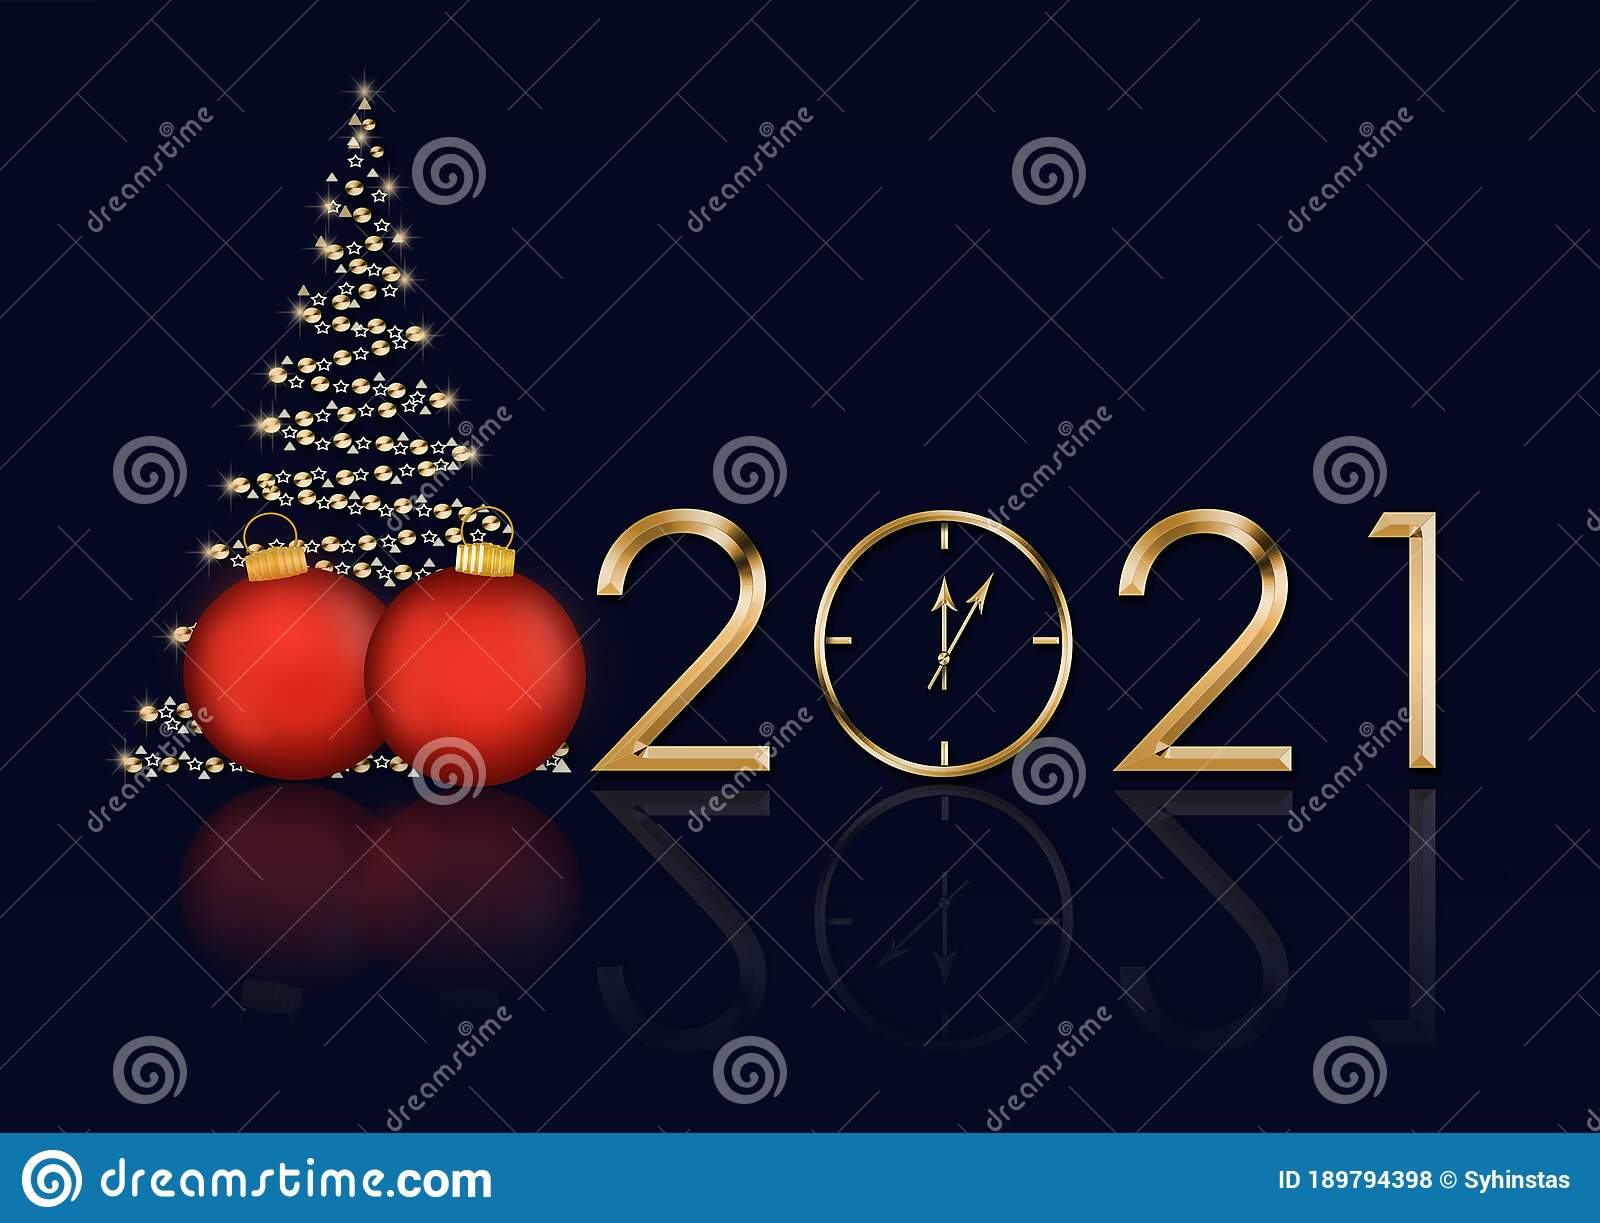 Photo Christmas Cards 2021